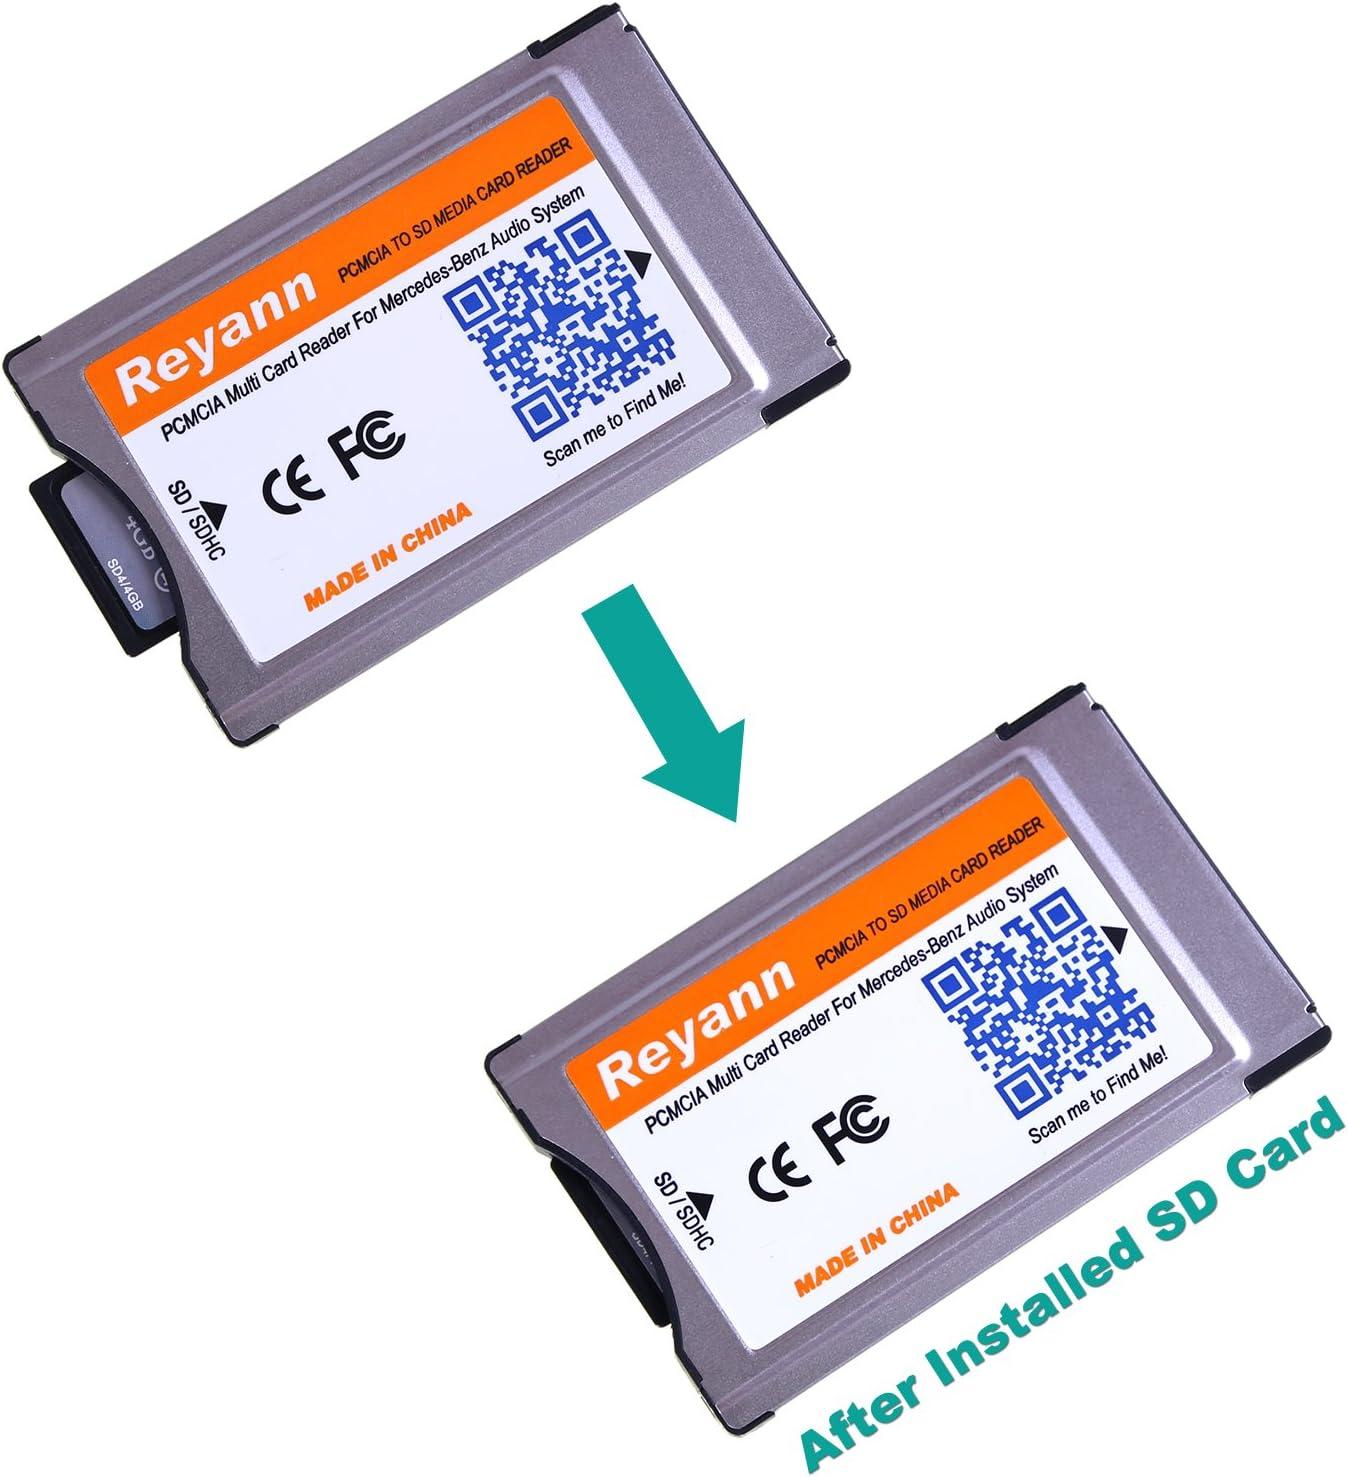 Amazon.com: hikig PCMCIA convertir adaptador de tarjetas SD ...